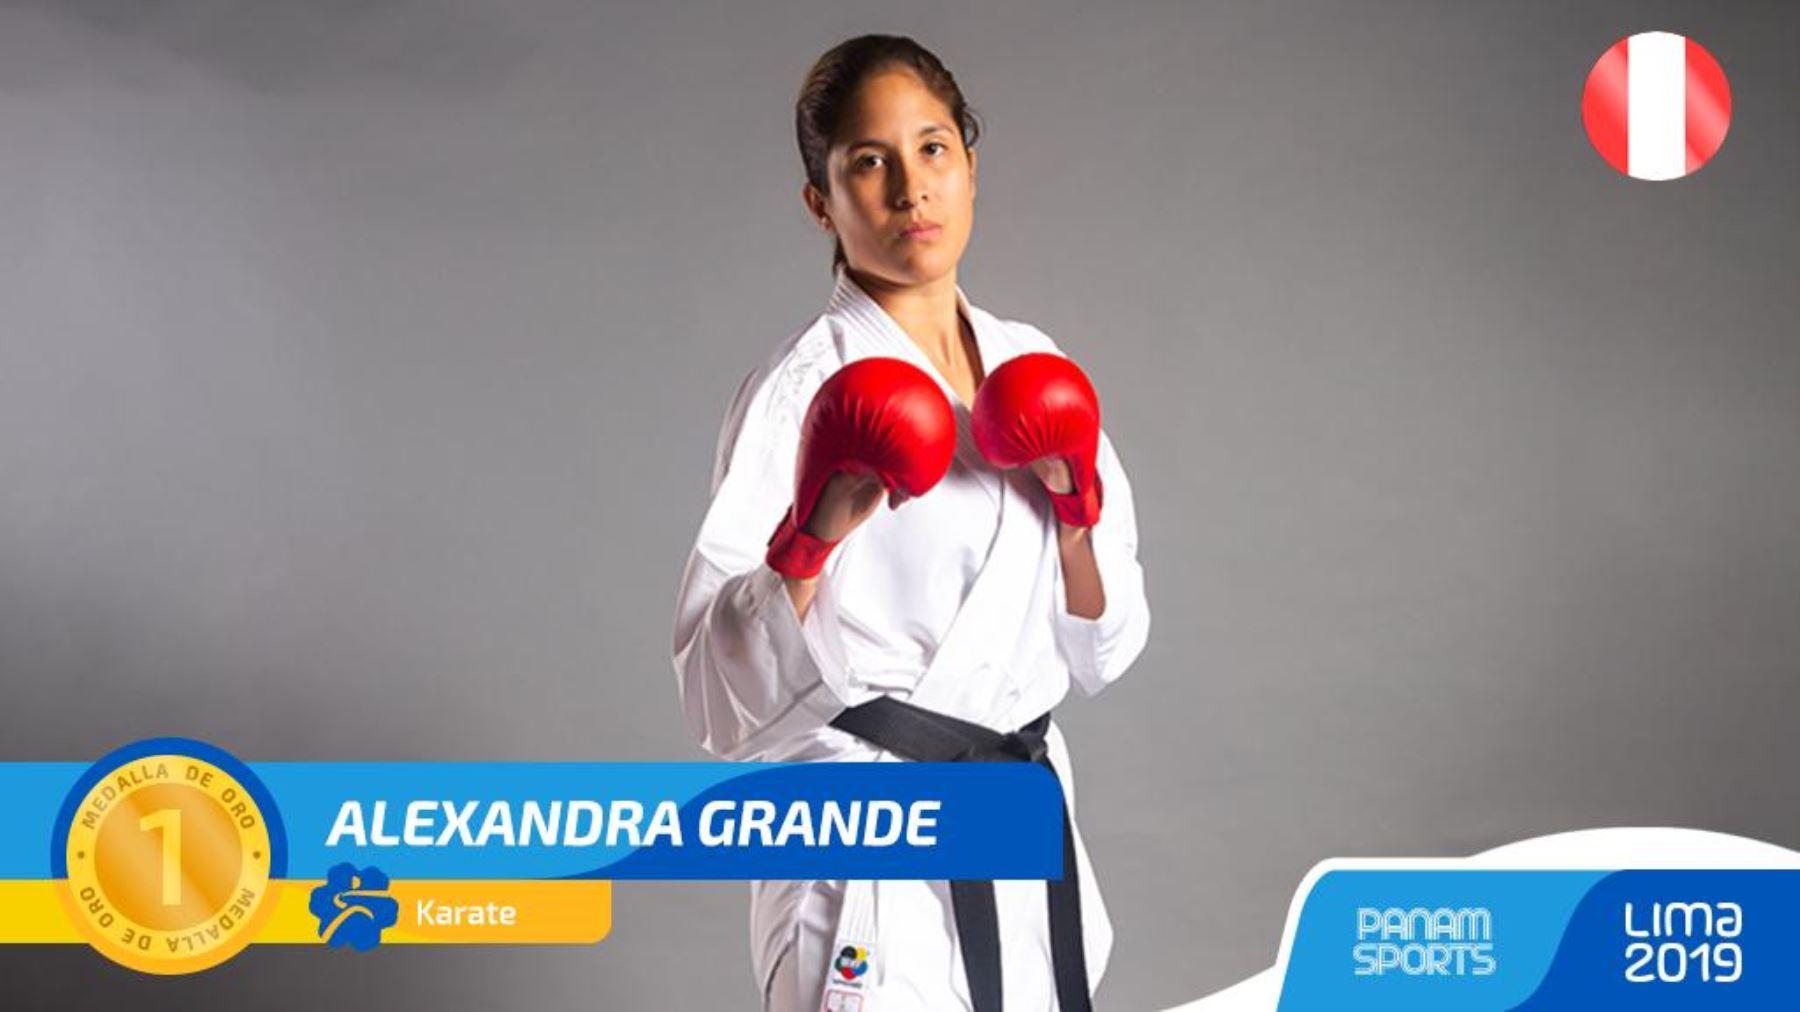 Medalla de oro para Alexandra Grande.